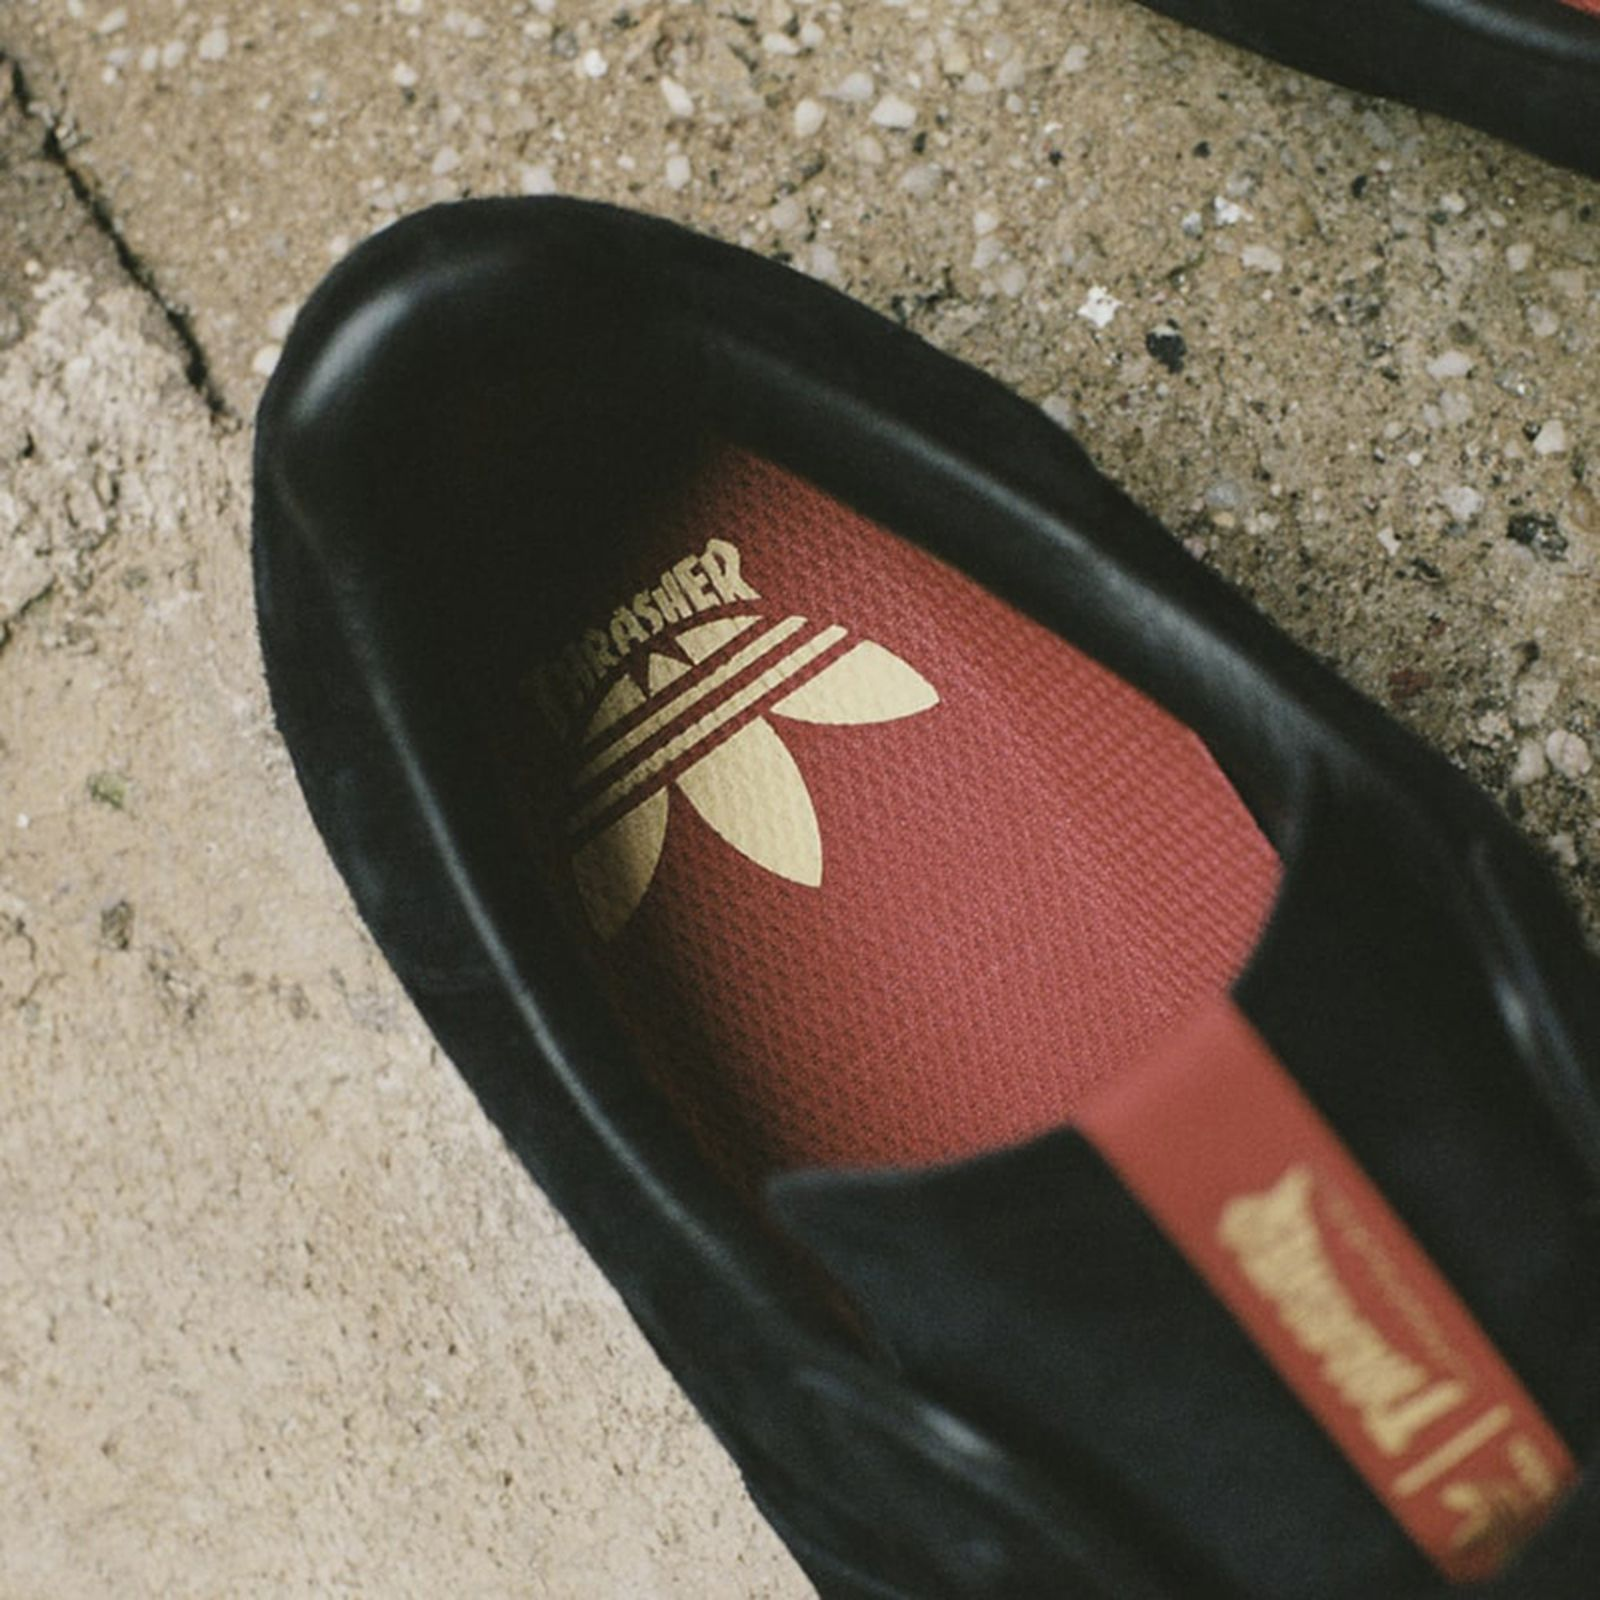 thrasher-adidas-superstar-adv-tyshawn-jones-release-date-price-02